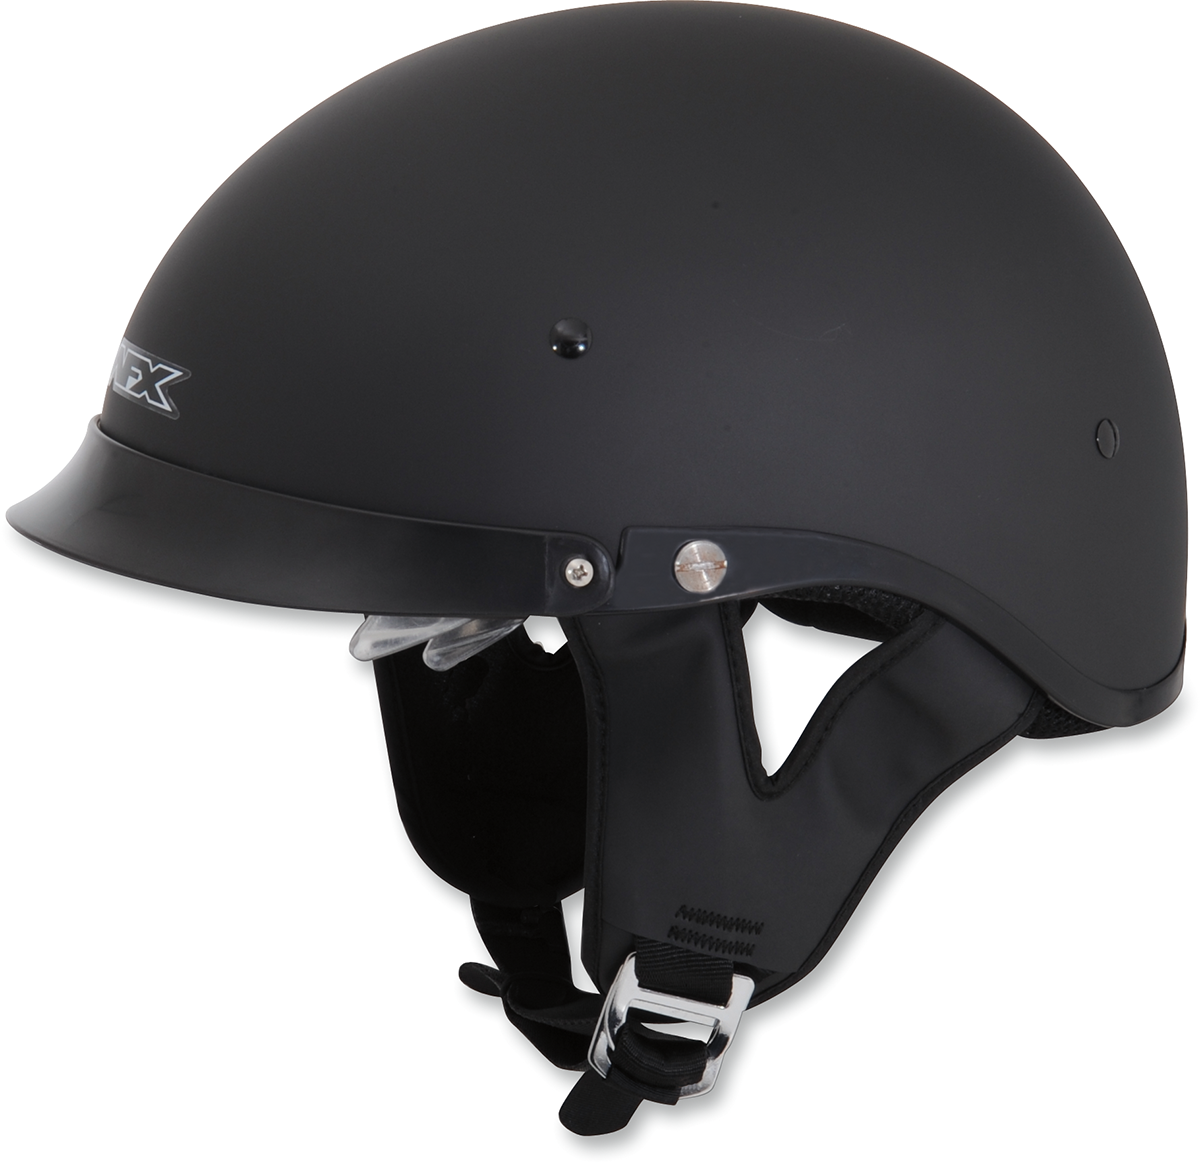 AFX Unisex FX200 Solid Flat Black Motorcycle Riding Street Beanie Half Helmet